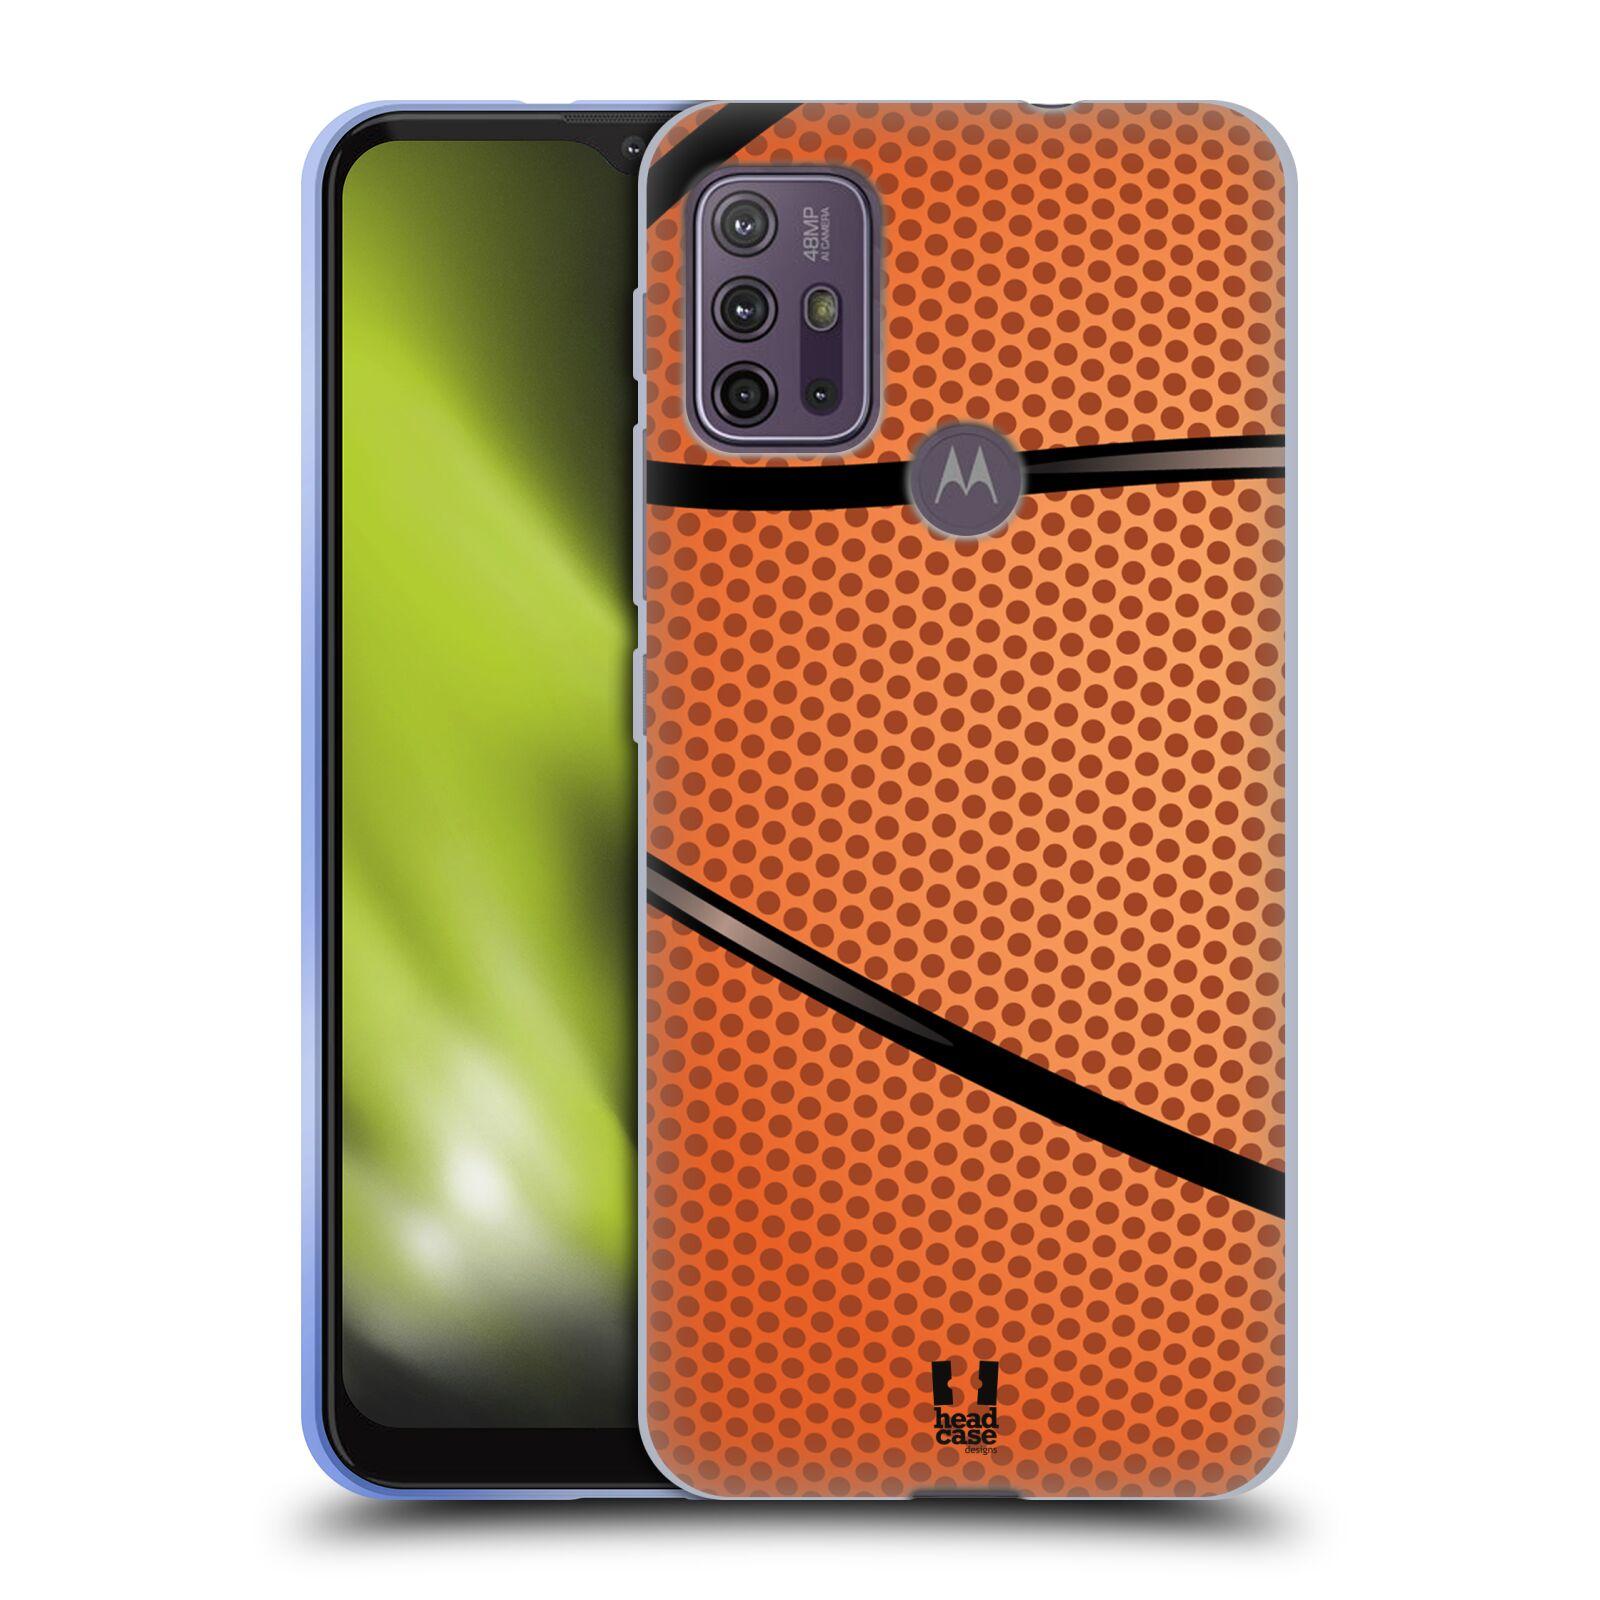 Silikonové pouzdro na mobil Motorola Moto G10 / G30 - Head Case - BASKEŤÁK